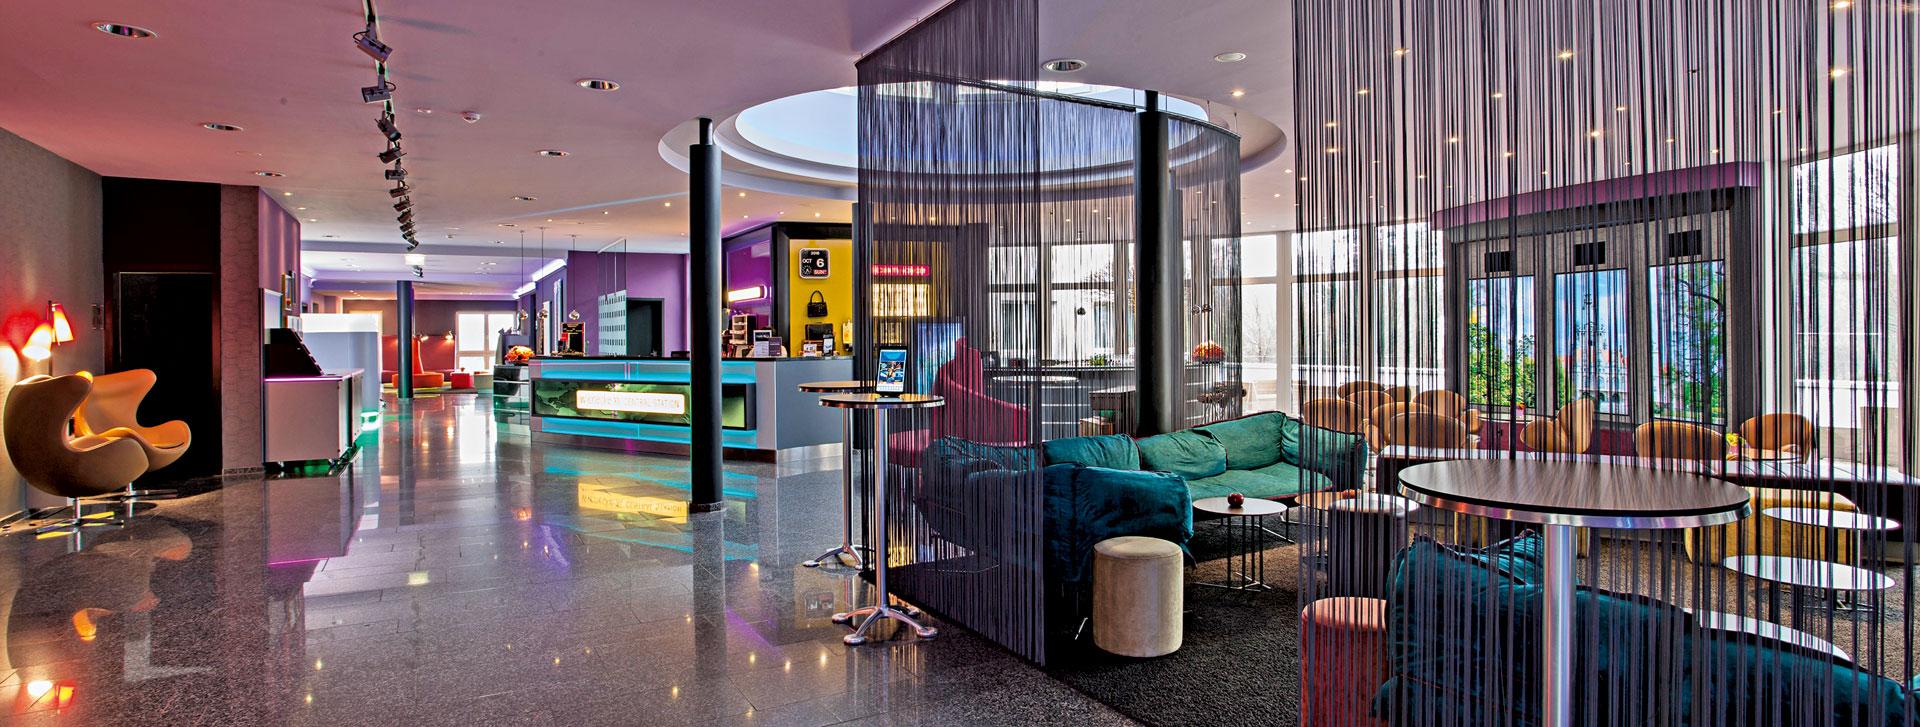 Designhotel congresscentrum wienecke xi in hannover auf for Wienecke xi designhotel congress